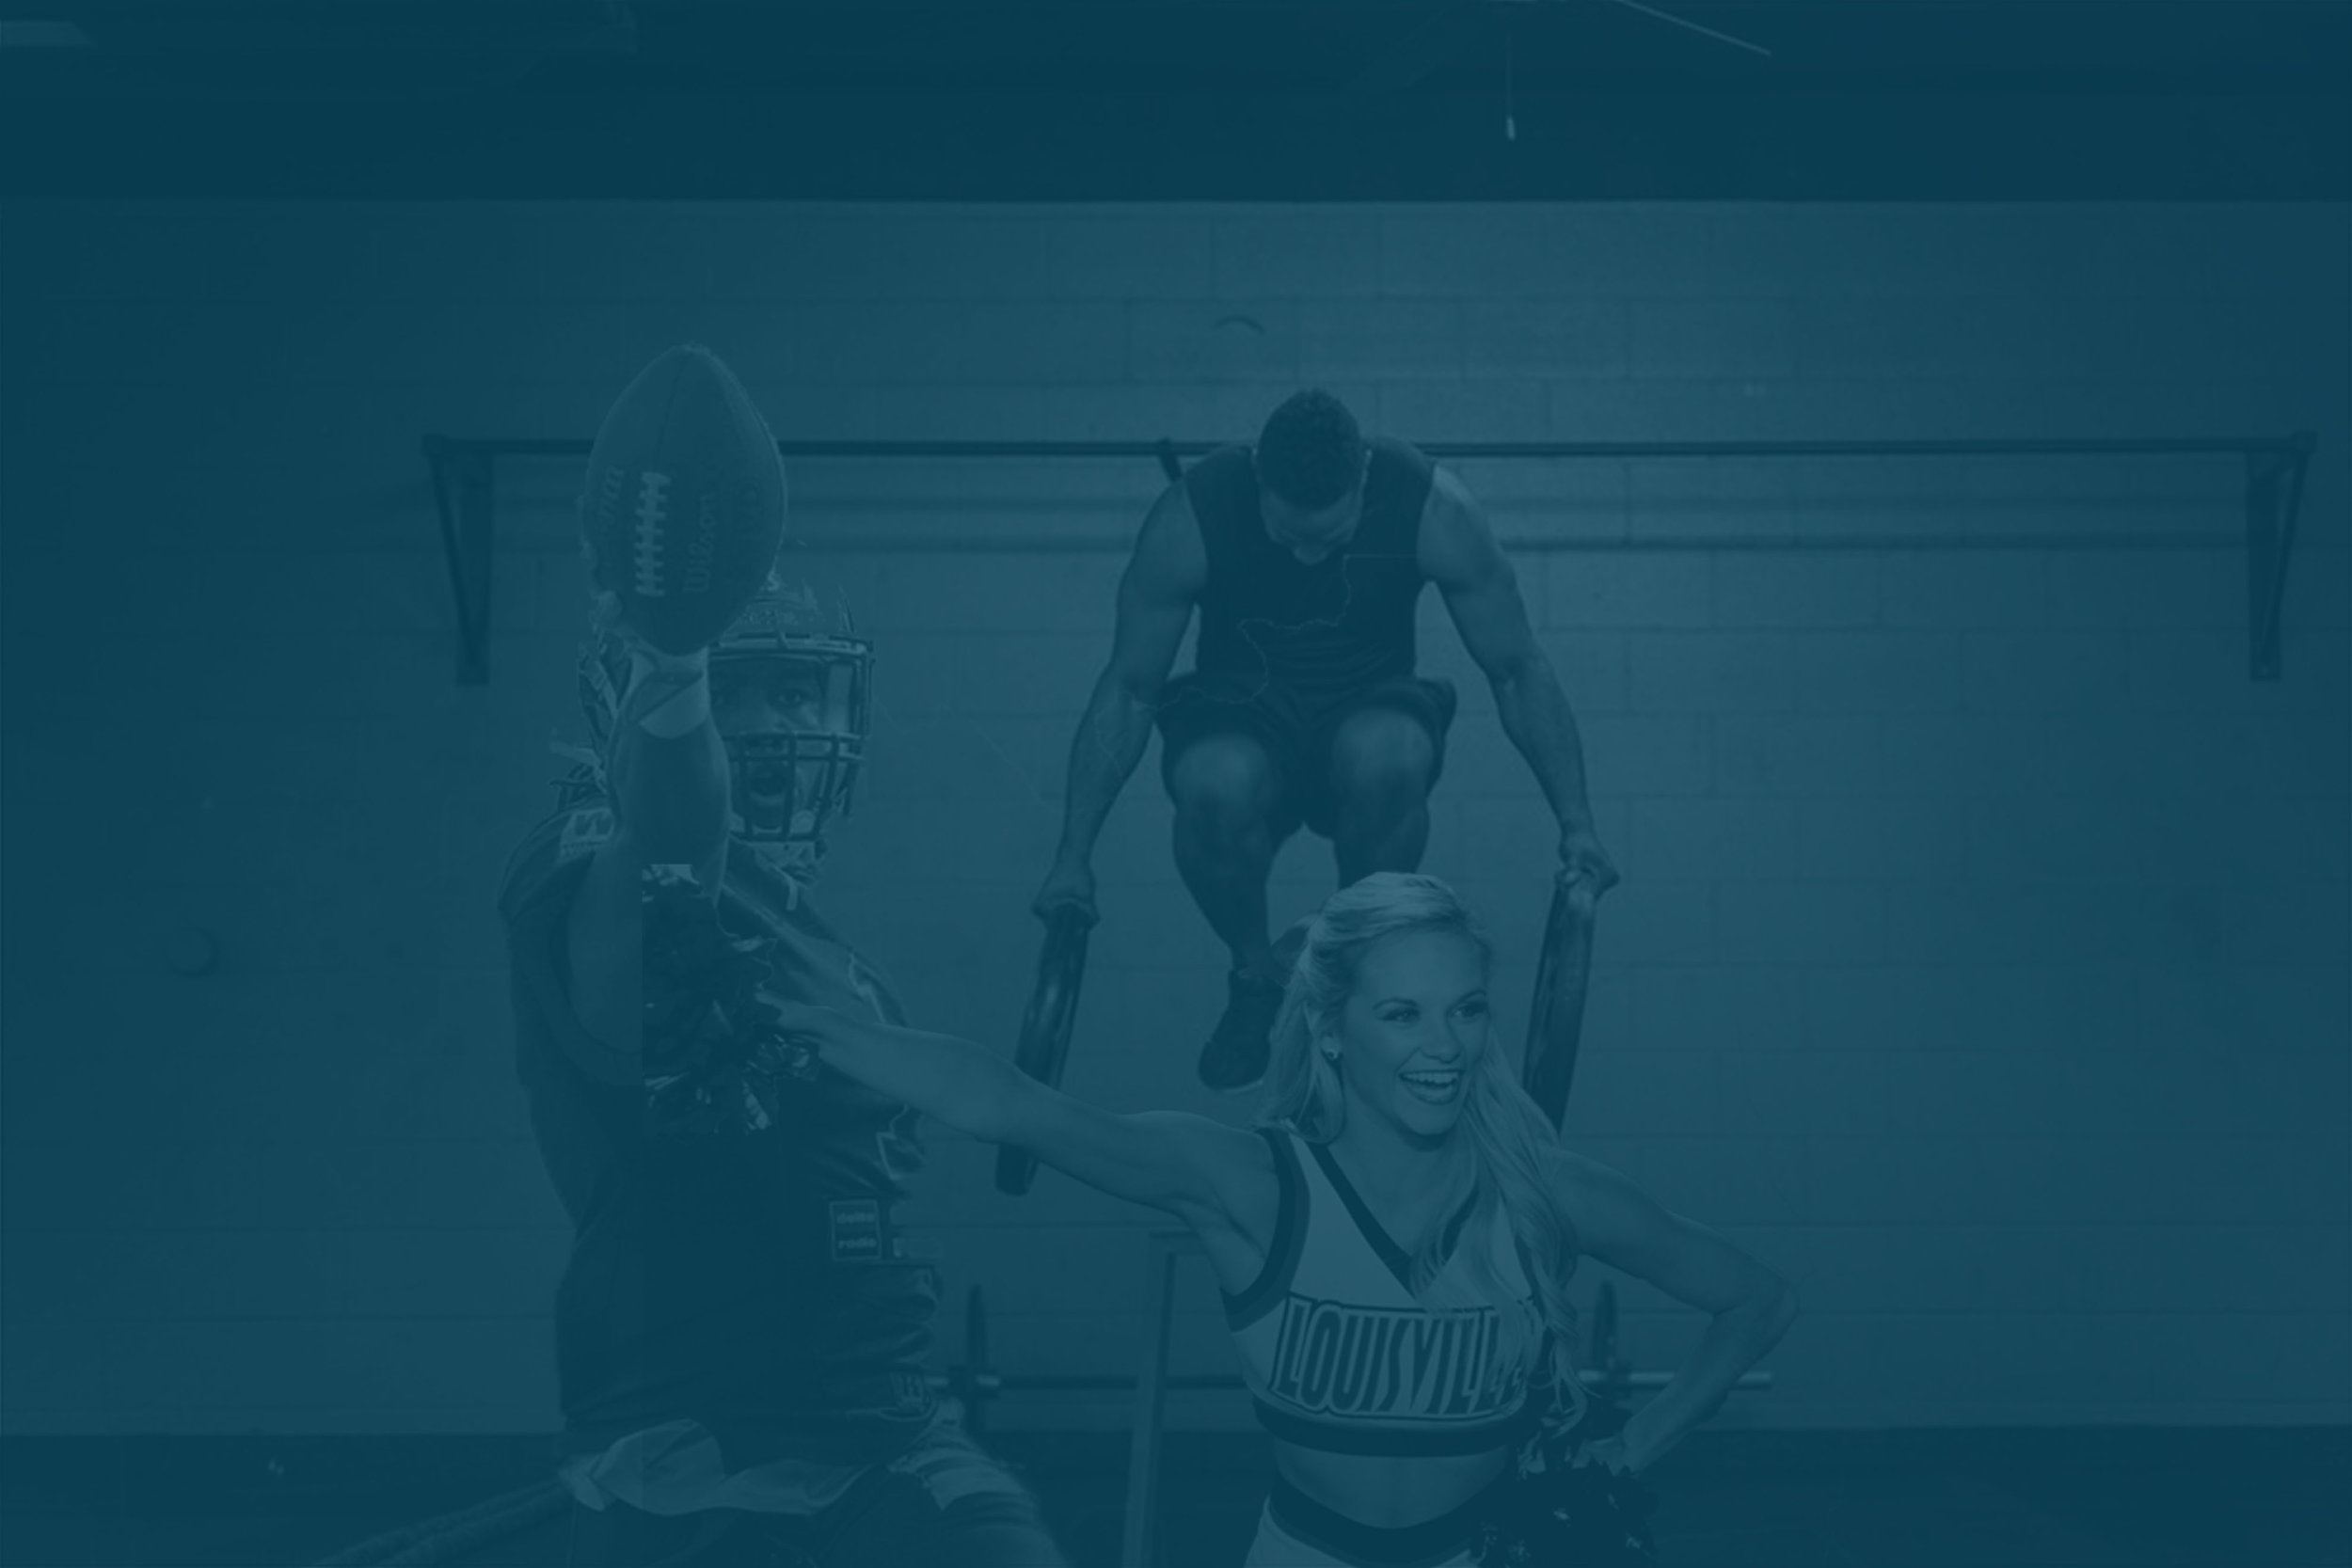 Clue: Find your D.I.G. Determination, Intensity, Guts. We believe fitness is more than physical, it is mind, body and soul. #behardCORE - BnaFit Trainer: JoJo Polk instagram: @jojopolkdig Facebook: @joseph polkAction: 5 jumping jacks